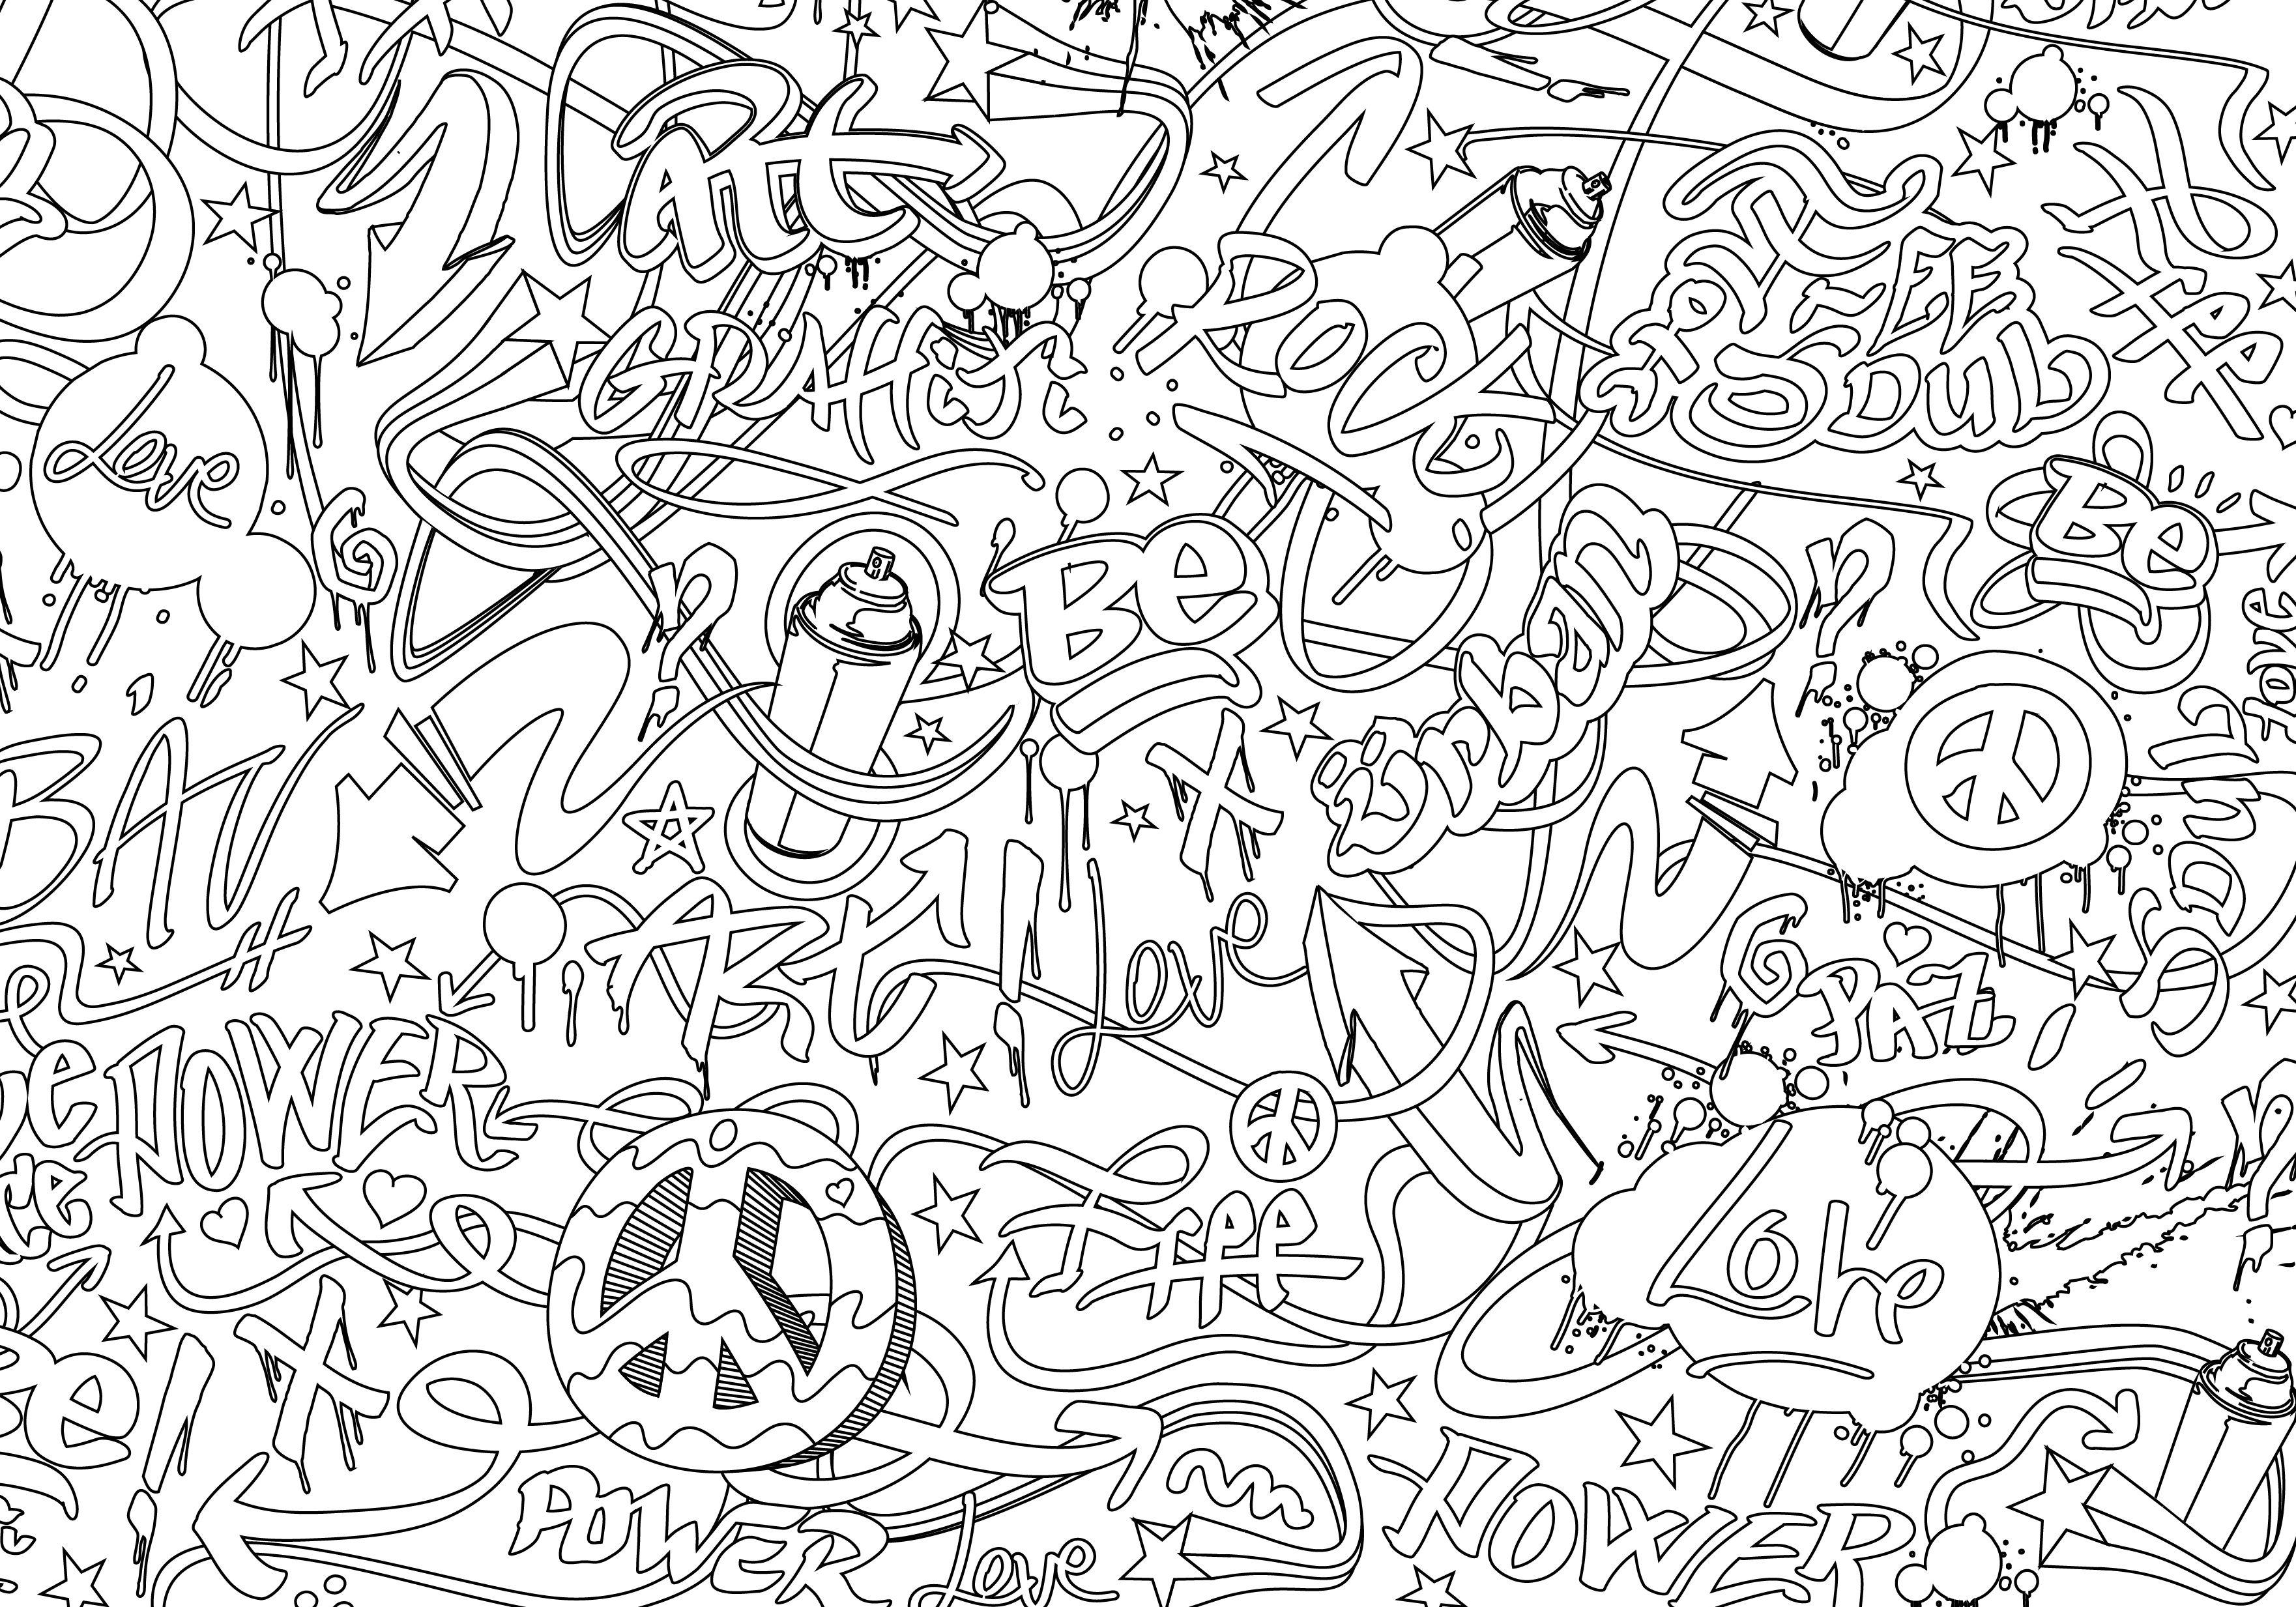 Graffiti coloriage coloriage - Coloriage graffiti ...